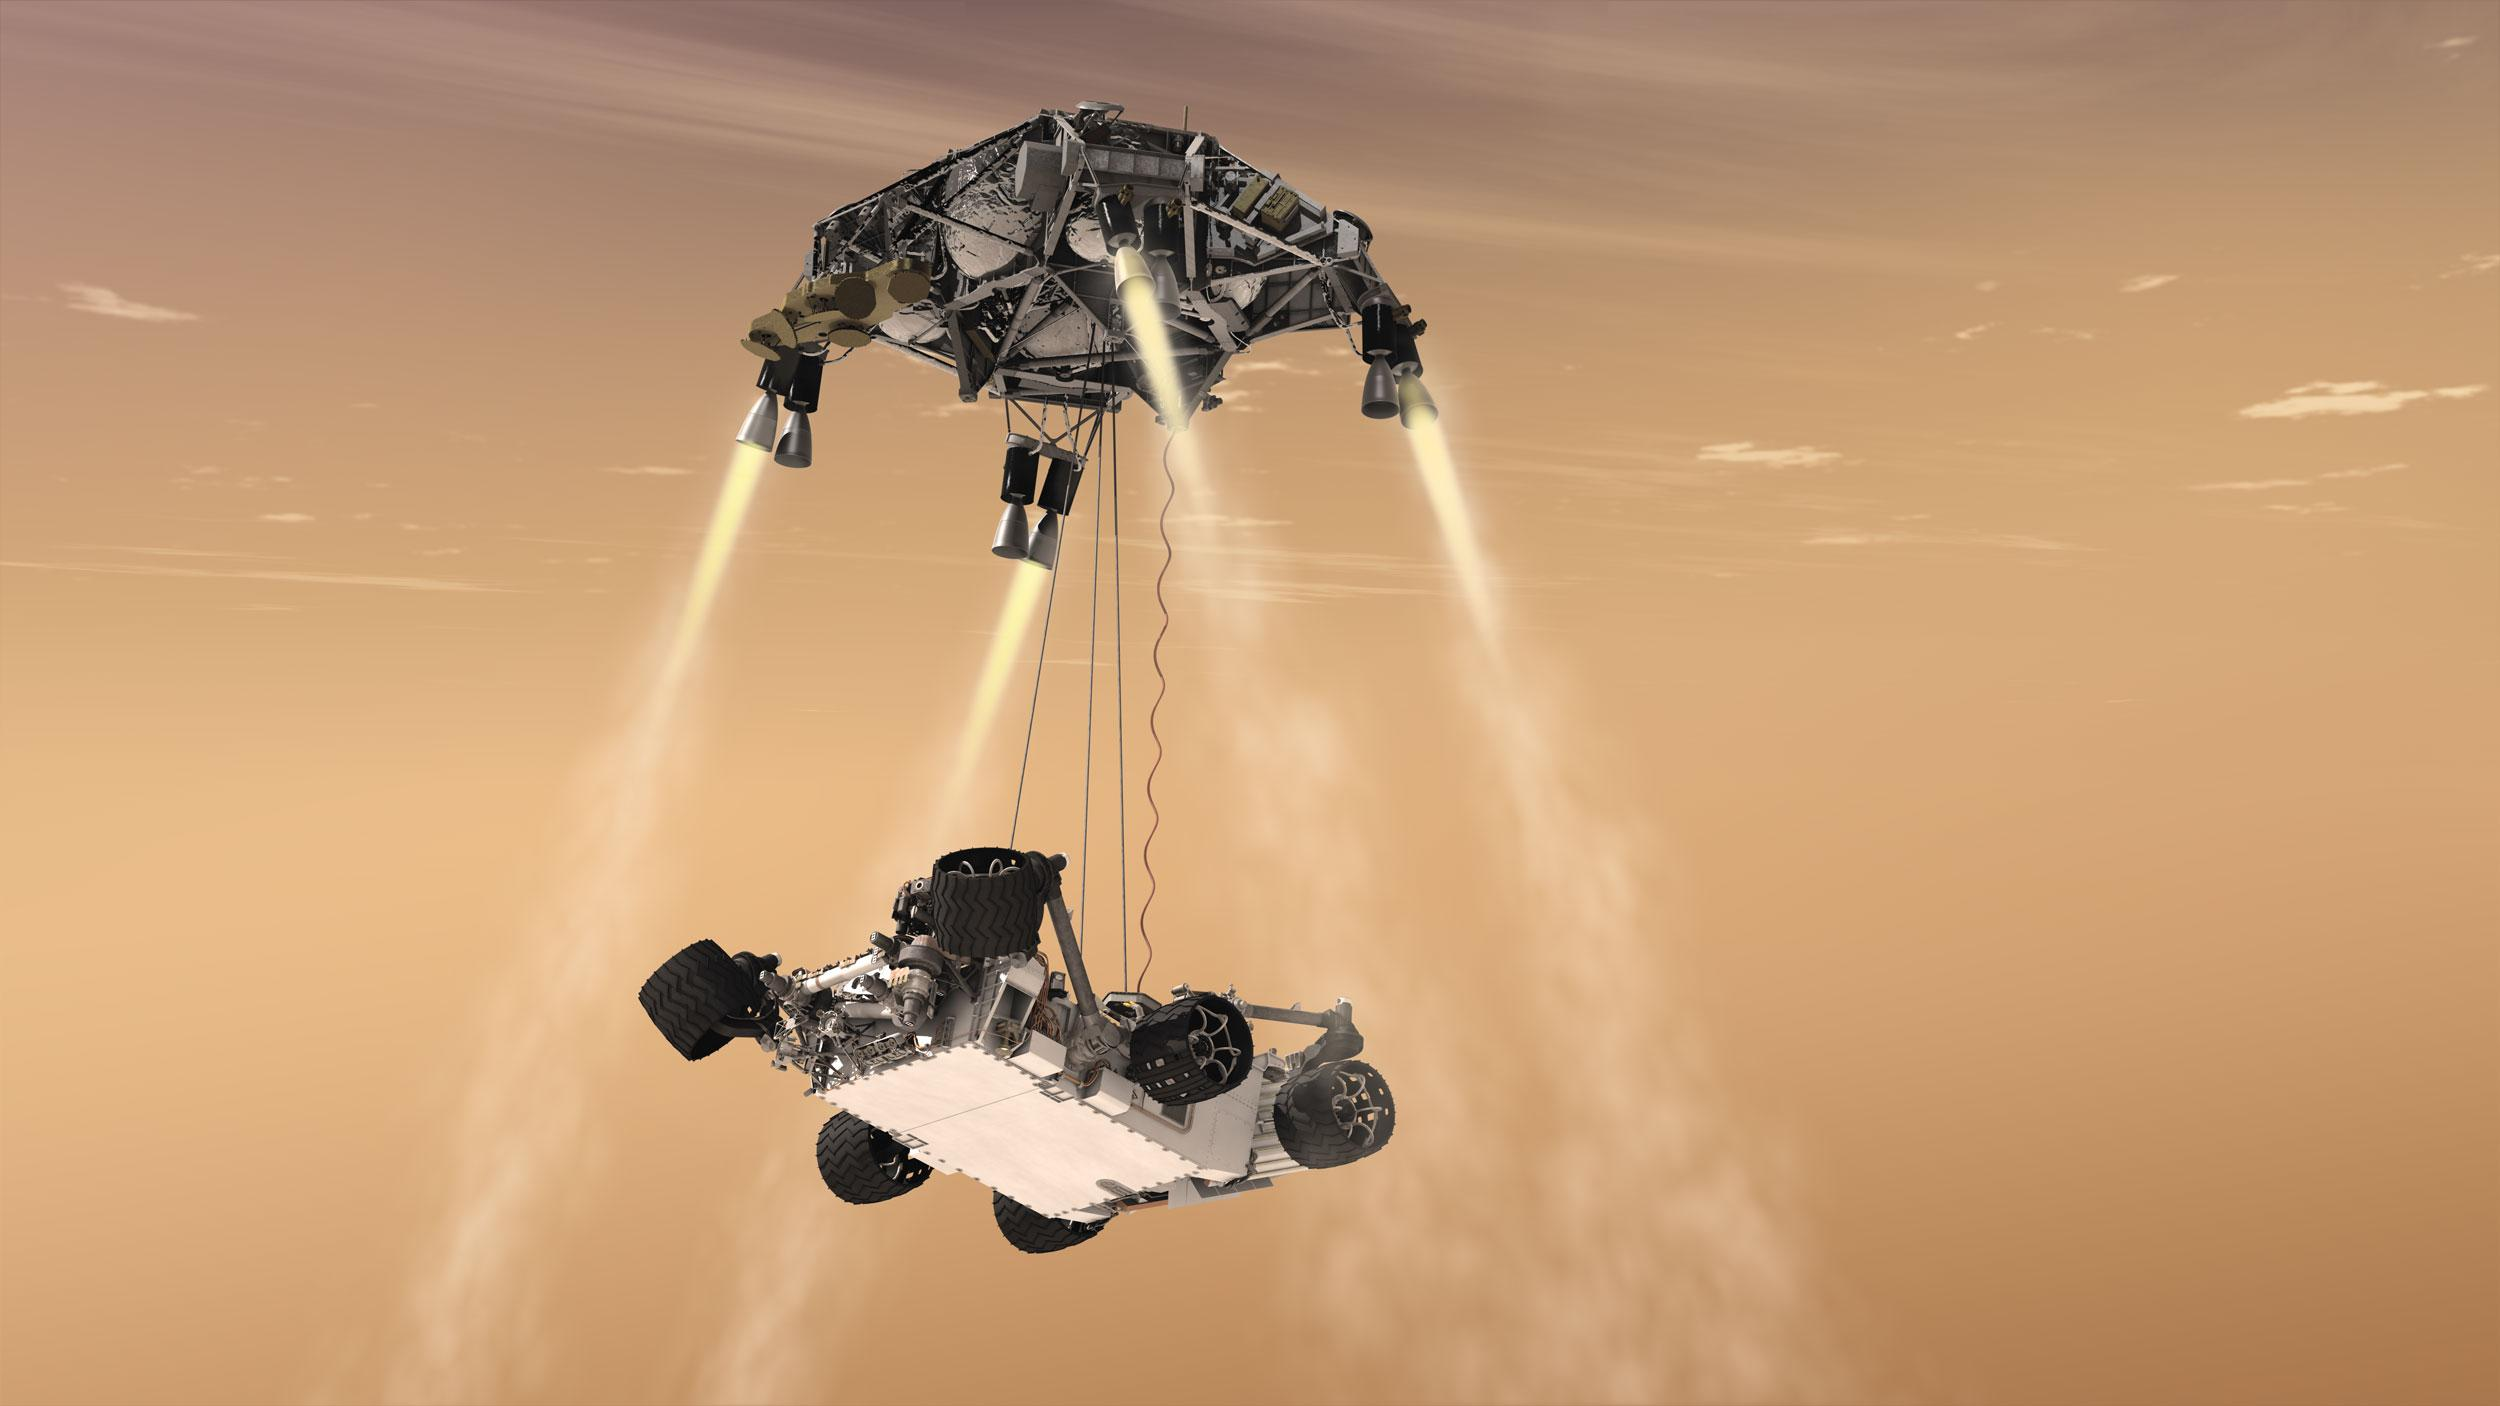 Despite Risk, Experts Bet on New Mars Rover's Audacious Landing Plan